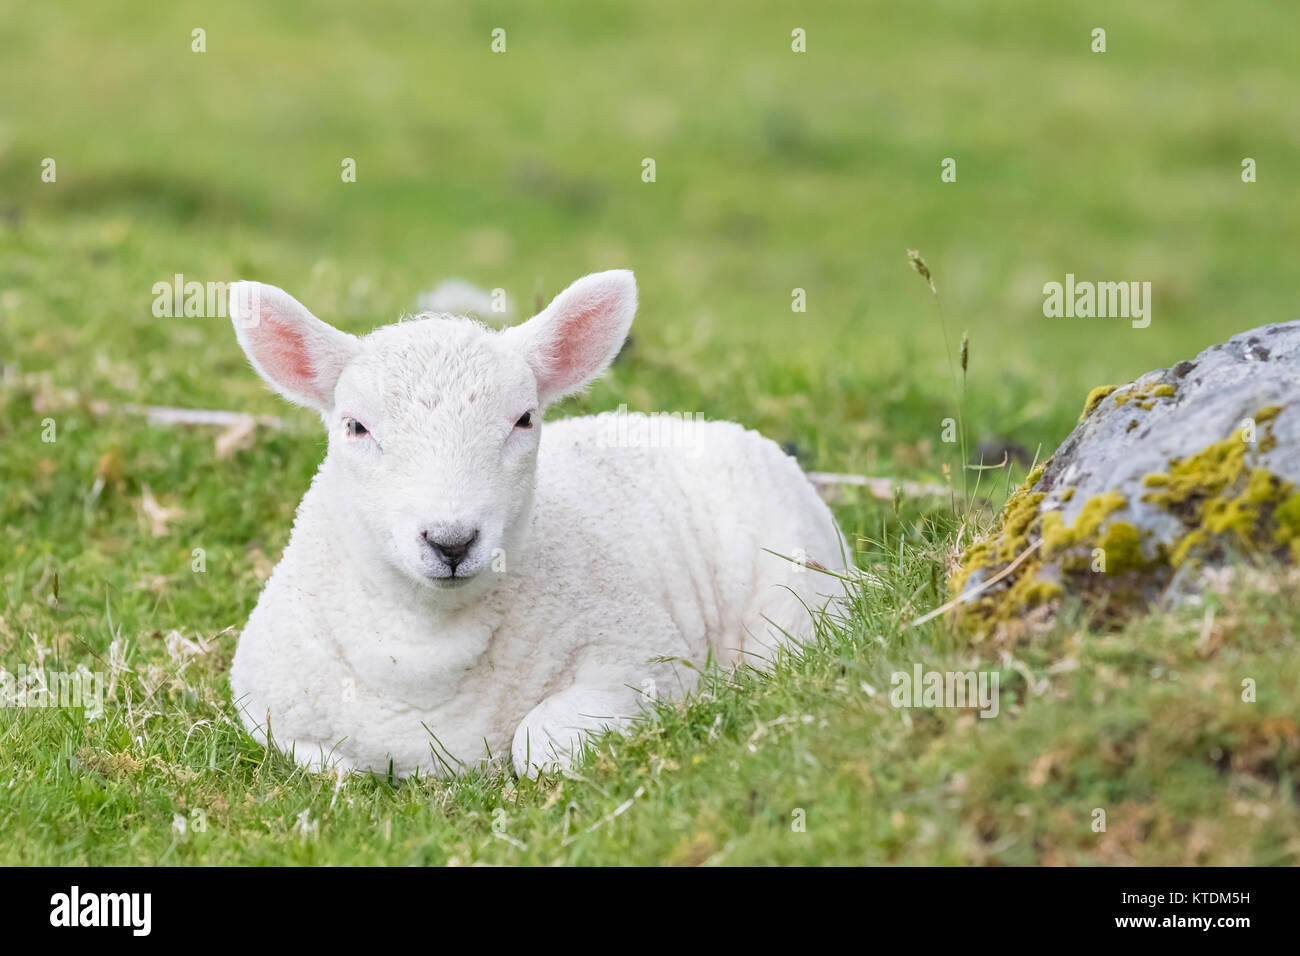 Great Britain, Scotland, Scottish Highlands, flock of sheep - Stock Image